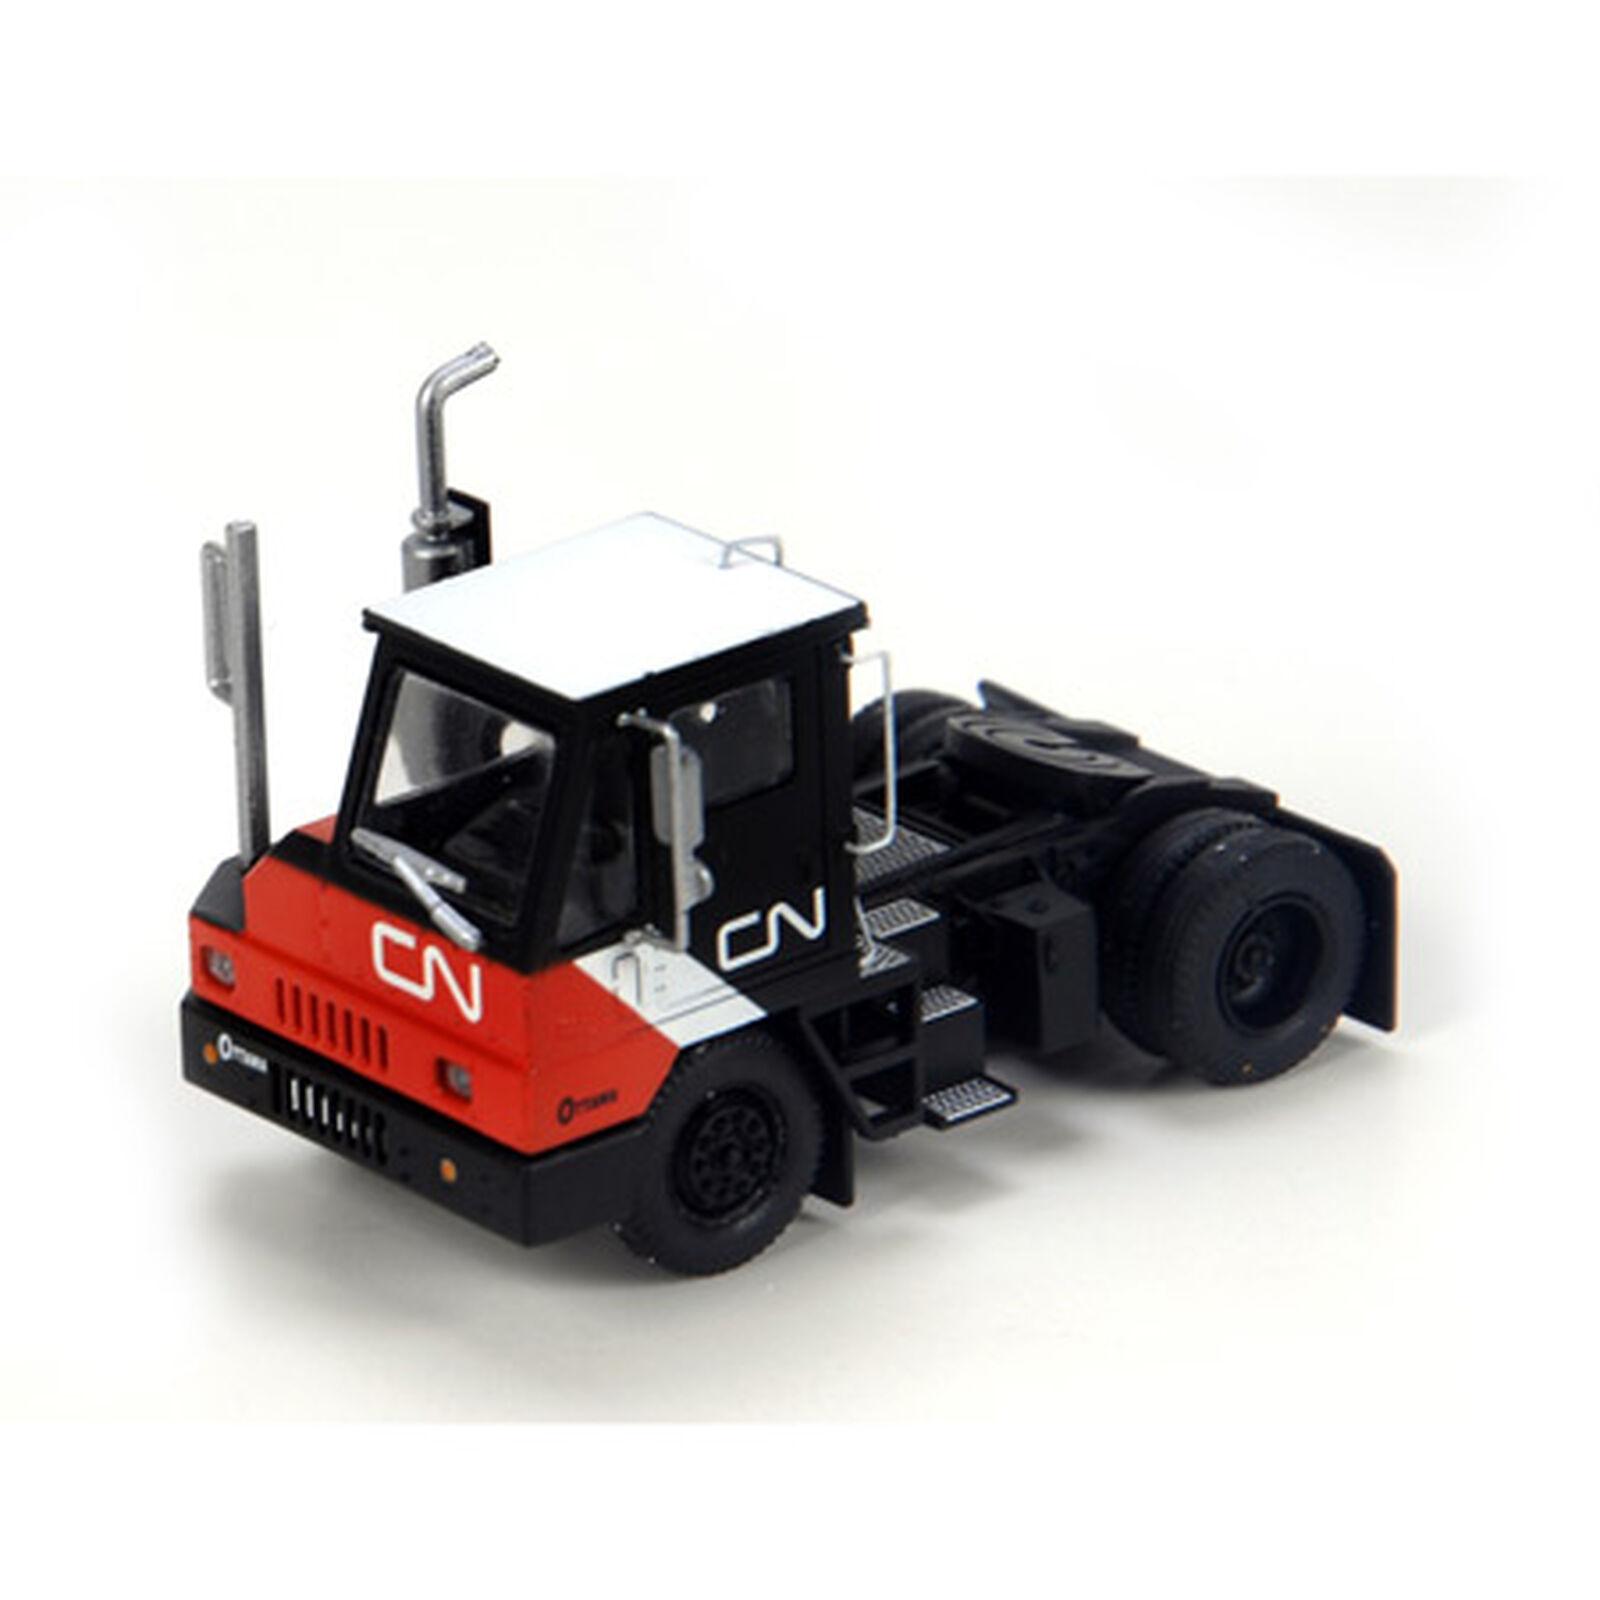 HO RTR Yard Tractor, CN